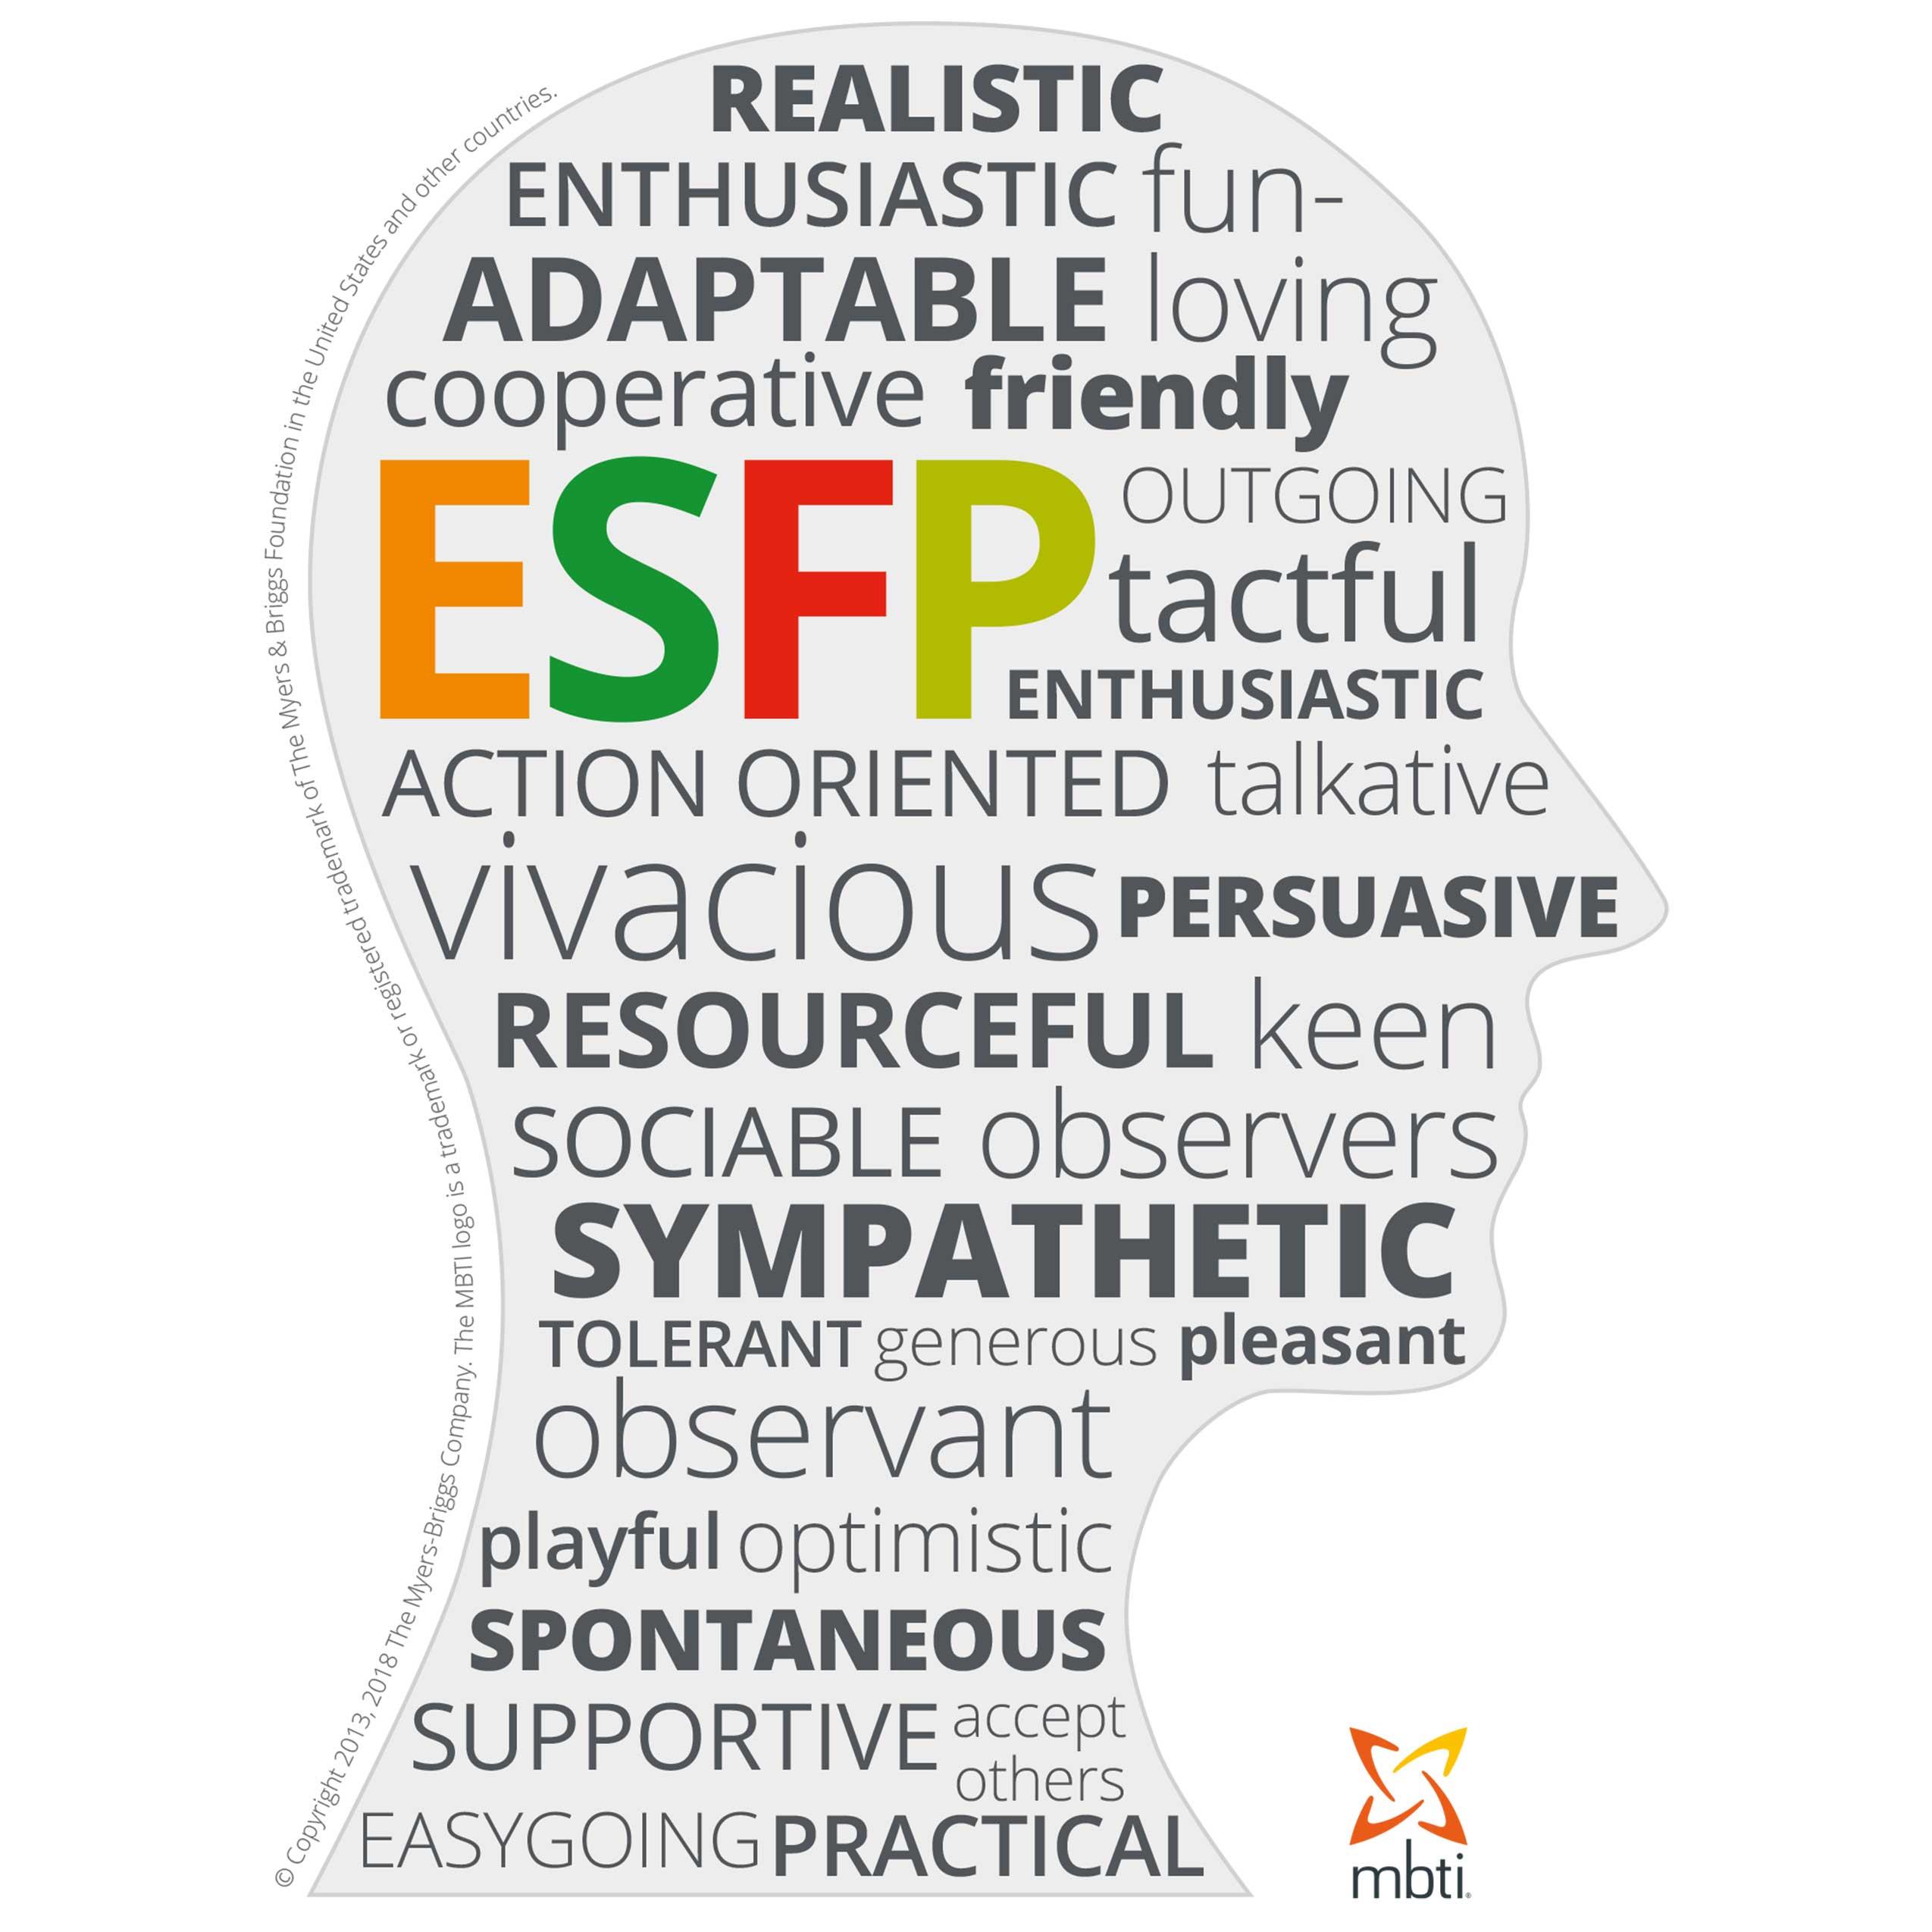 MBTI Myers-Briggs Personality Type Characteristics ESFP